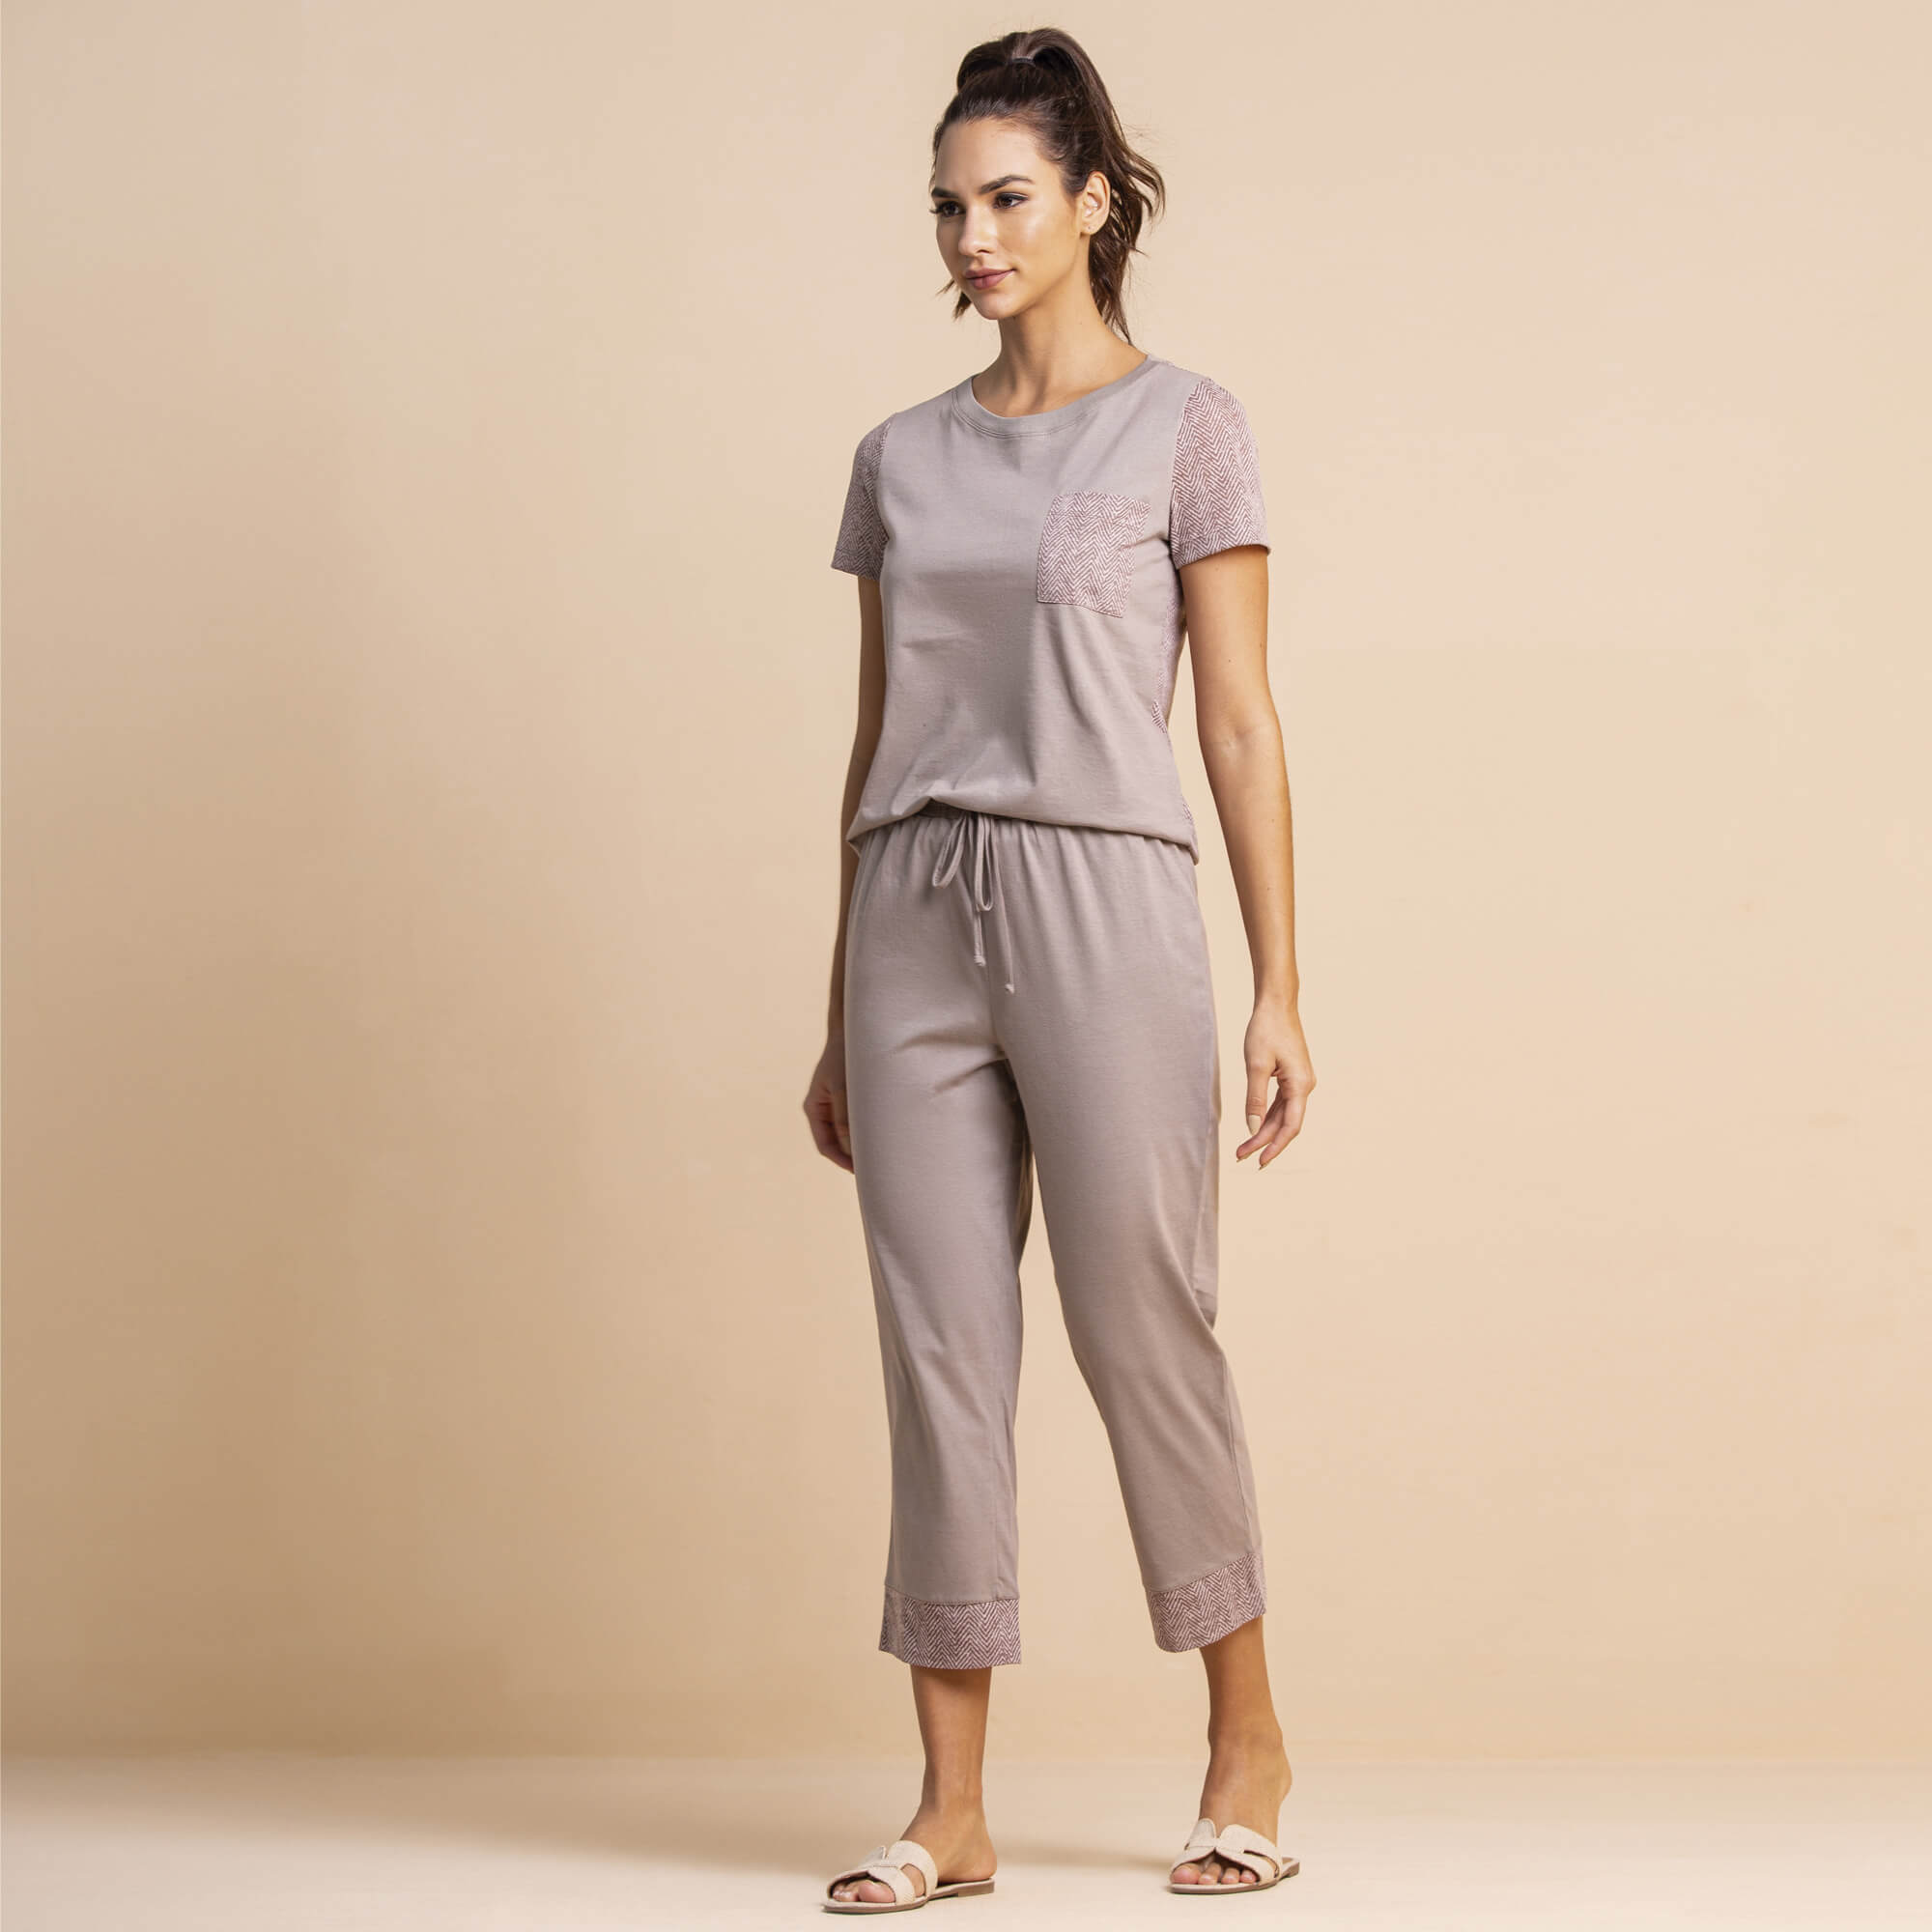 Pijama pantacourt zigzag